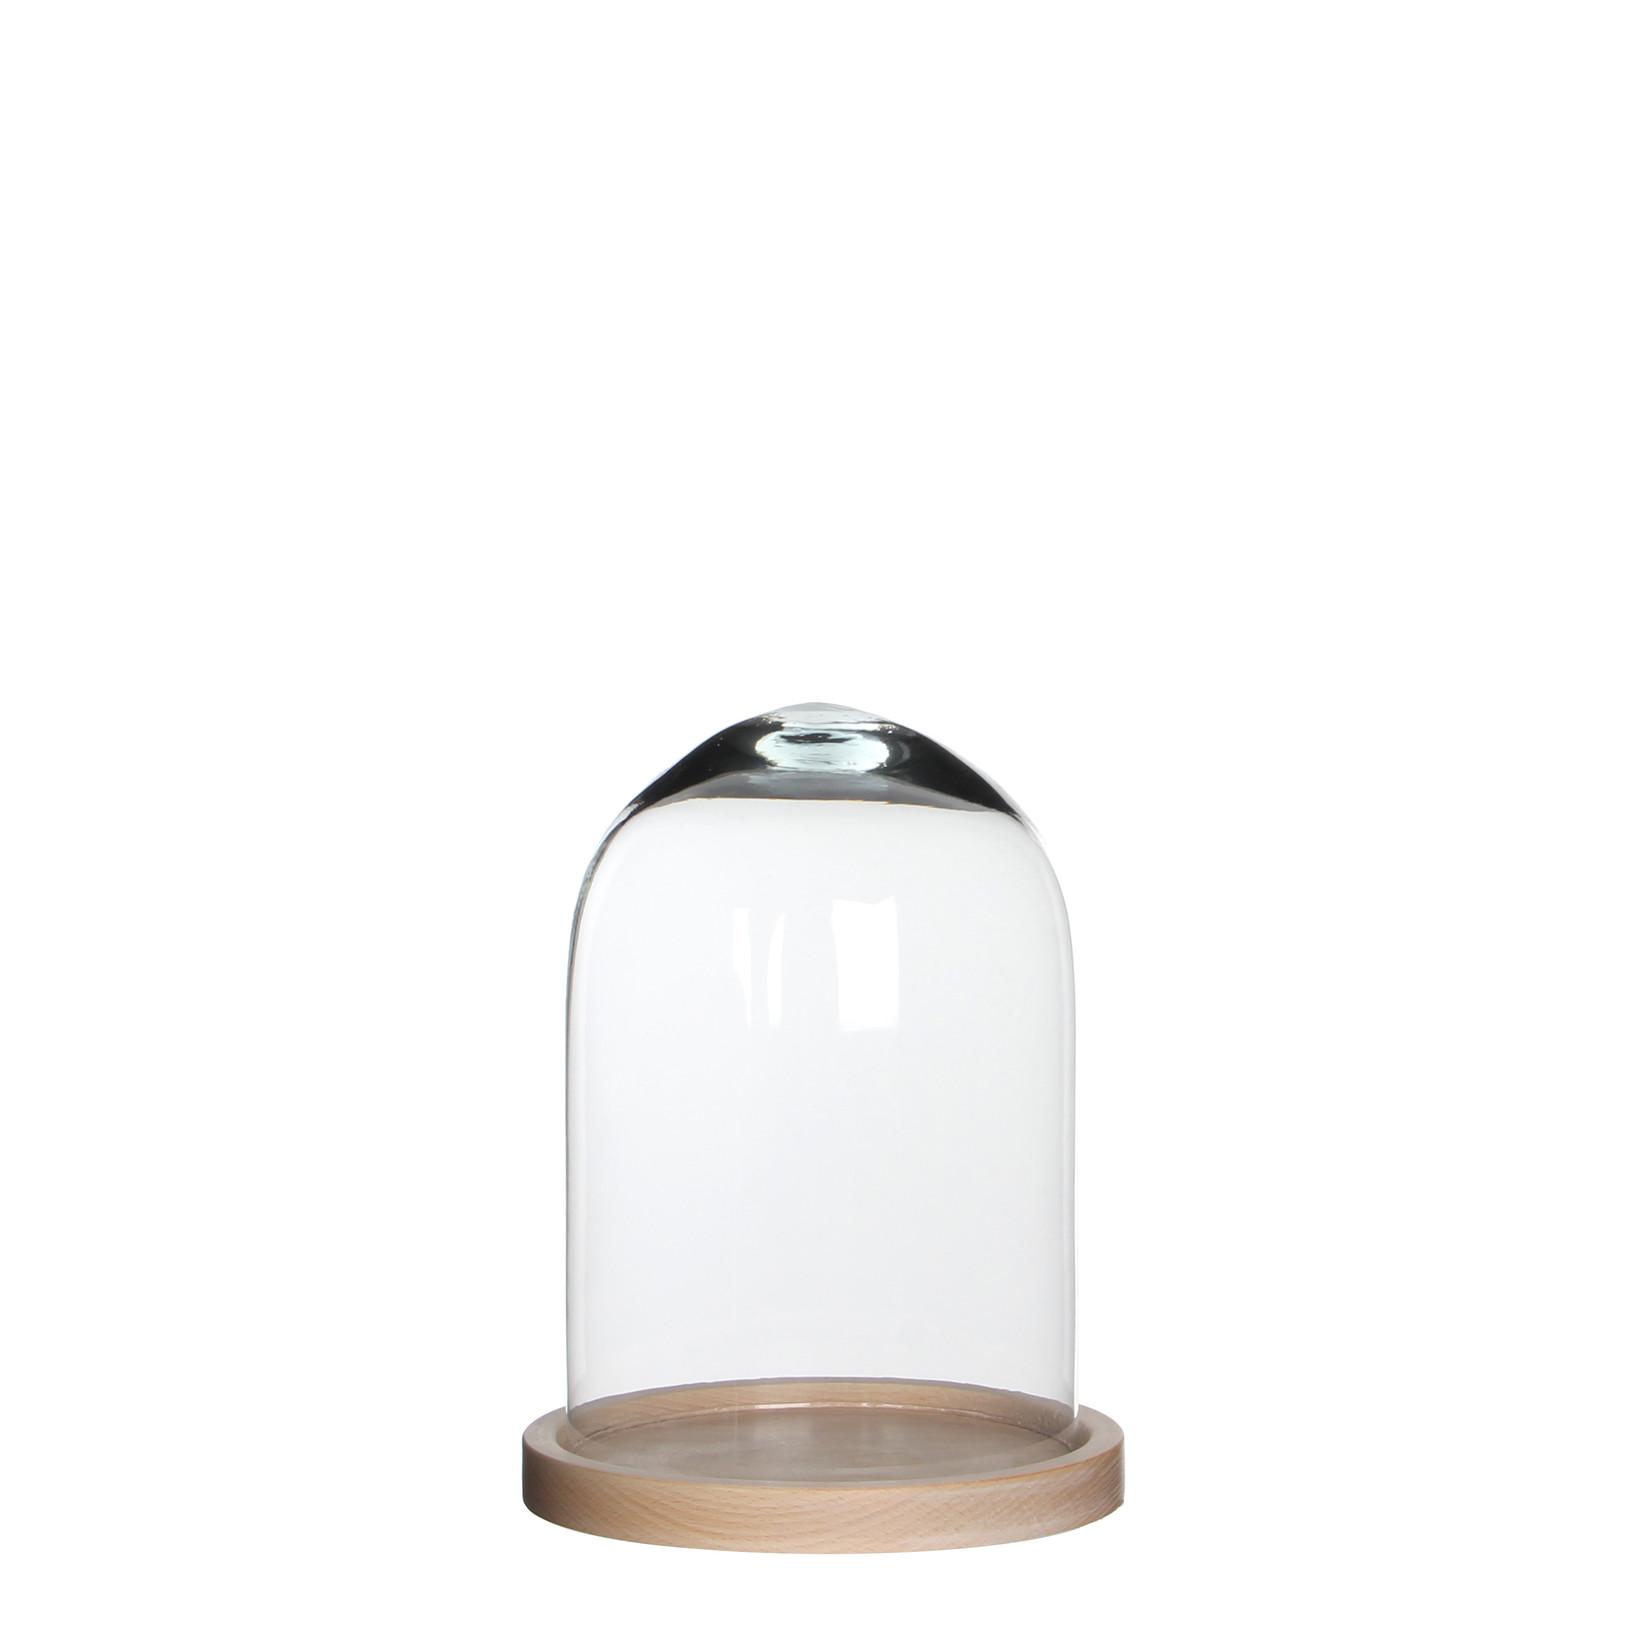 MiCa 242311 Bell jar Hella wood S